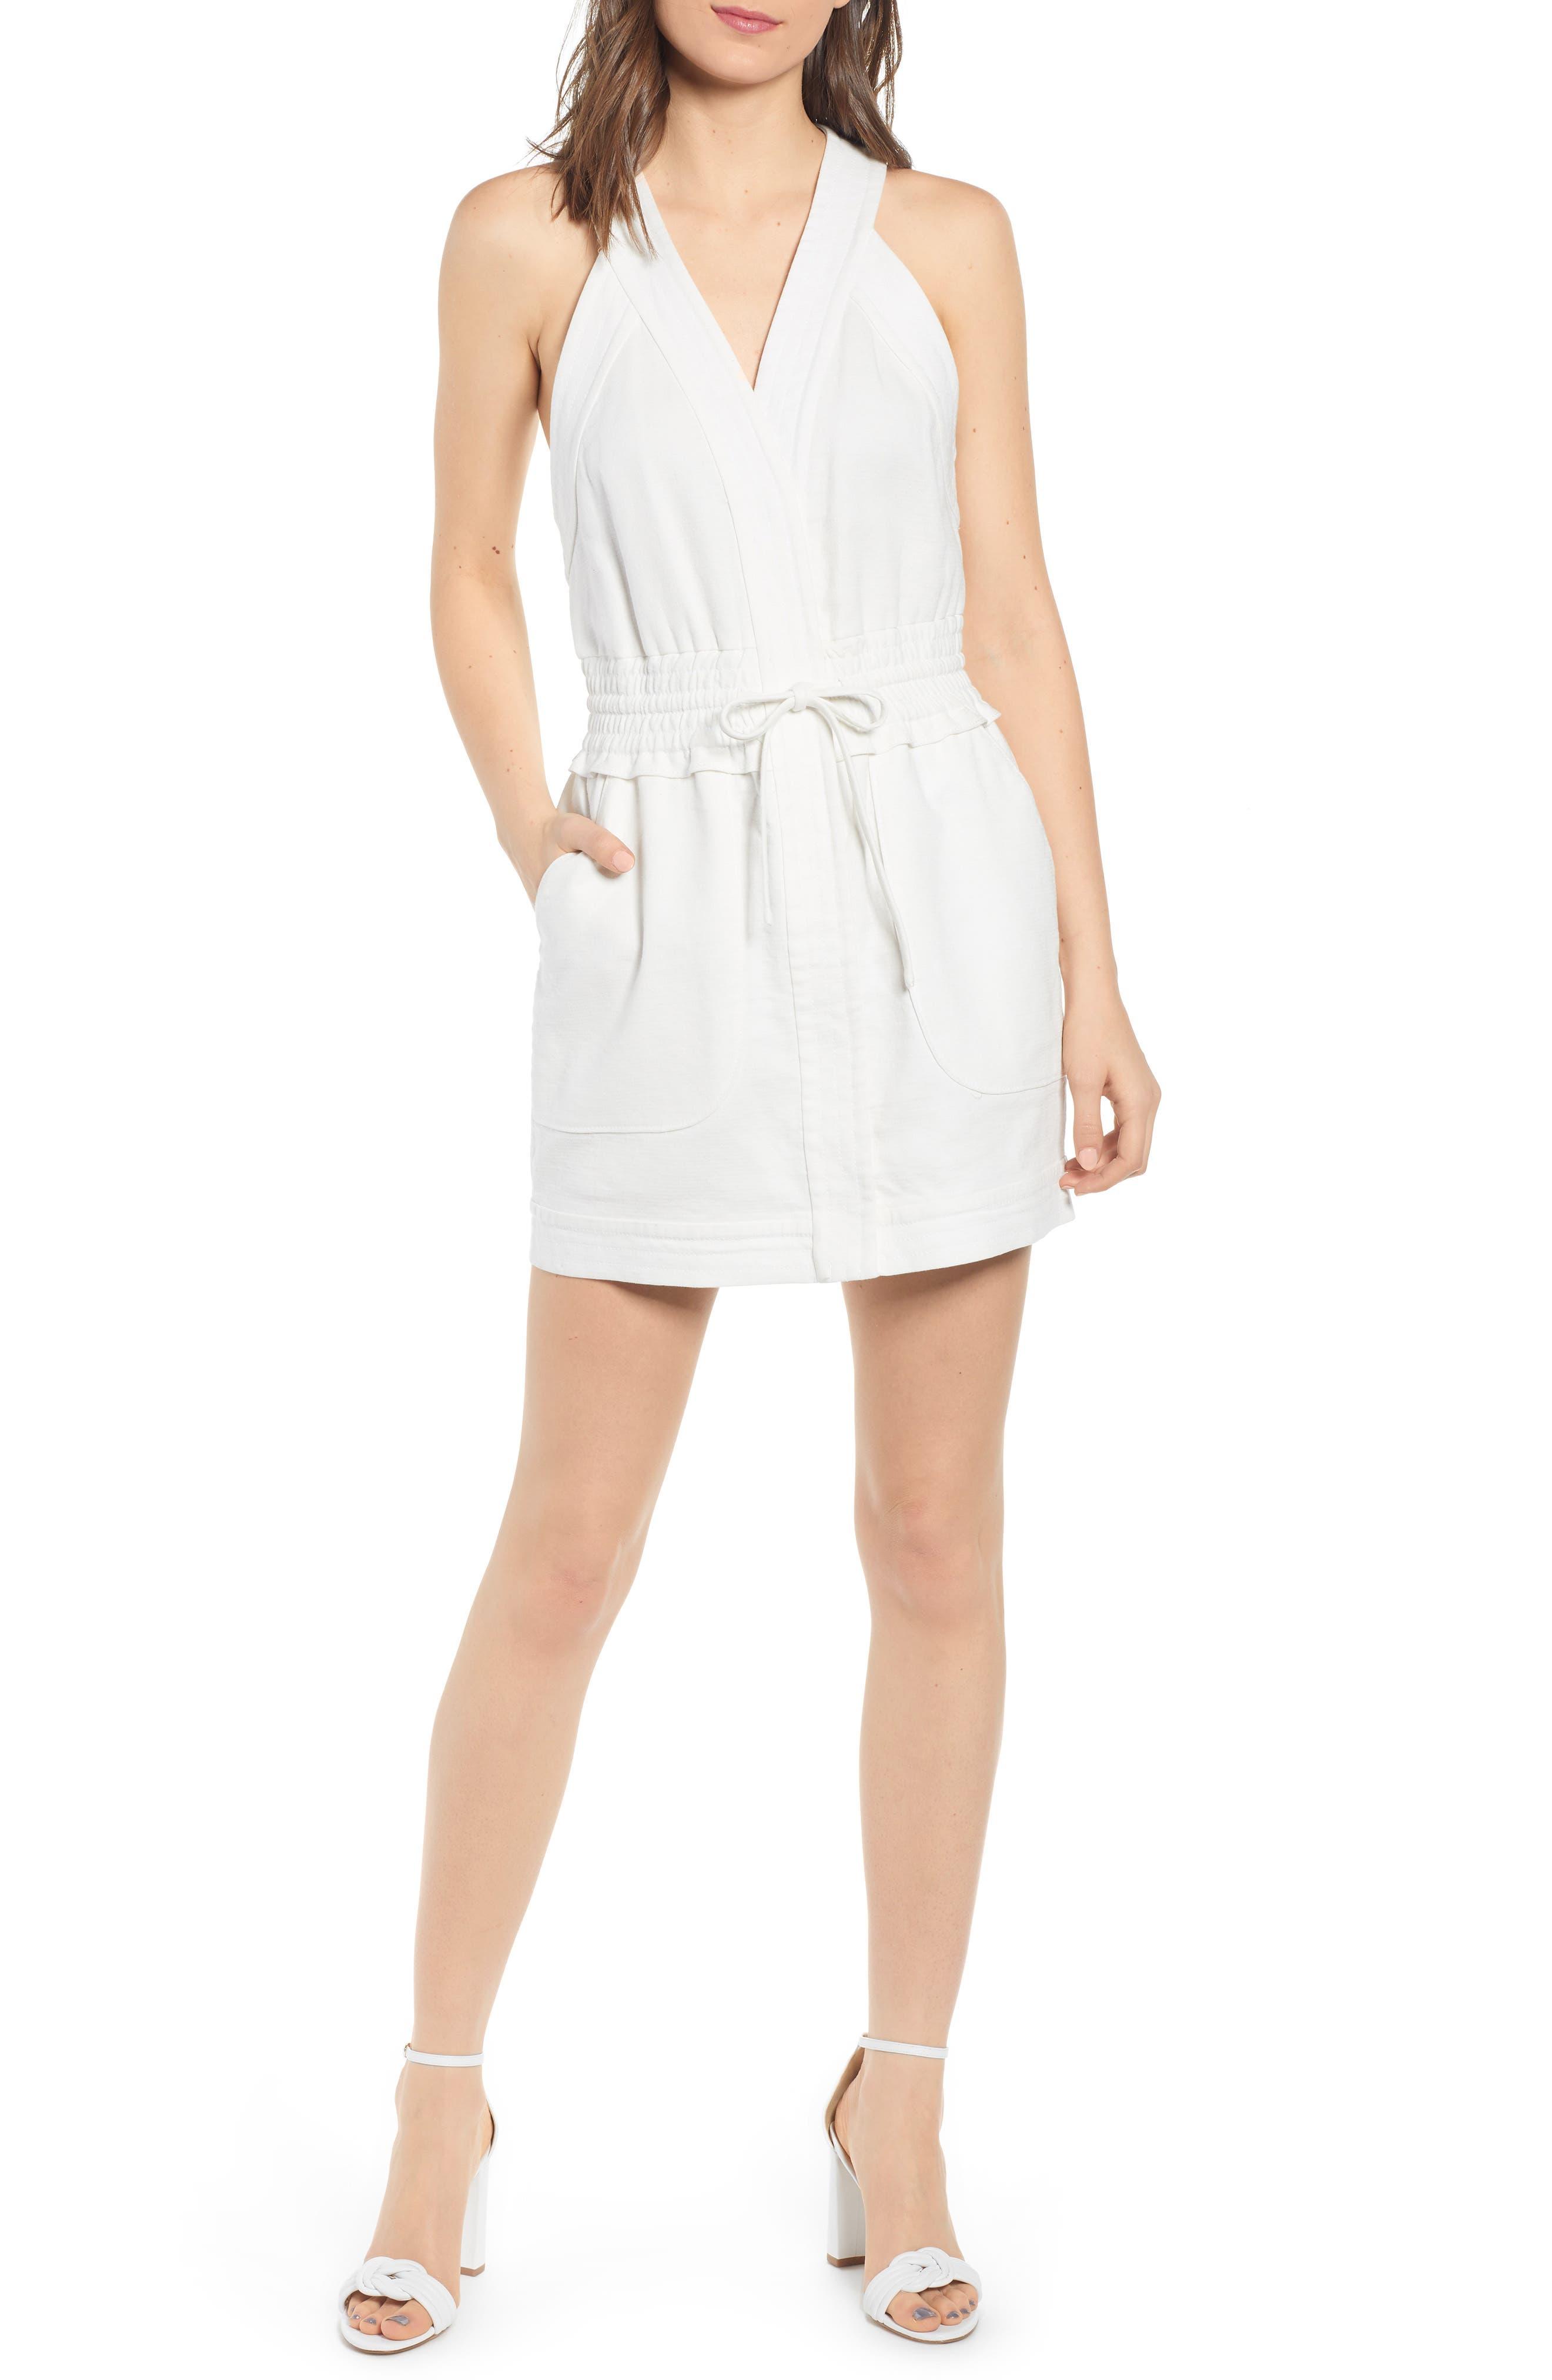 Rebecca Minkoff Royal Racerback Dress, White